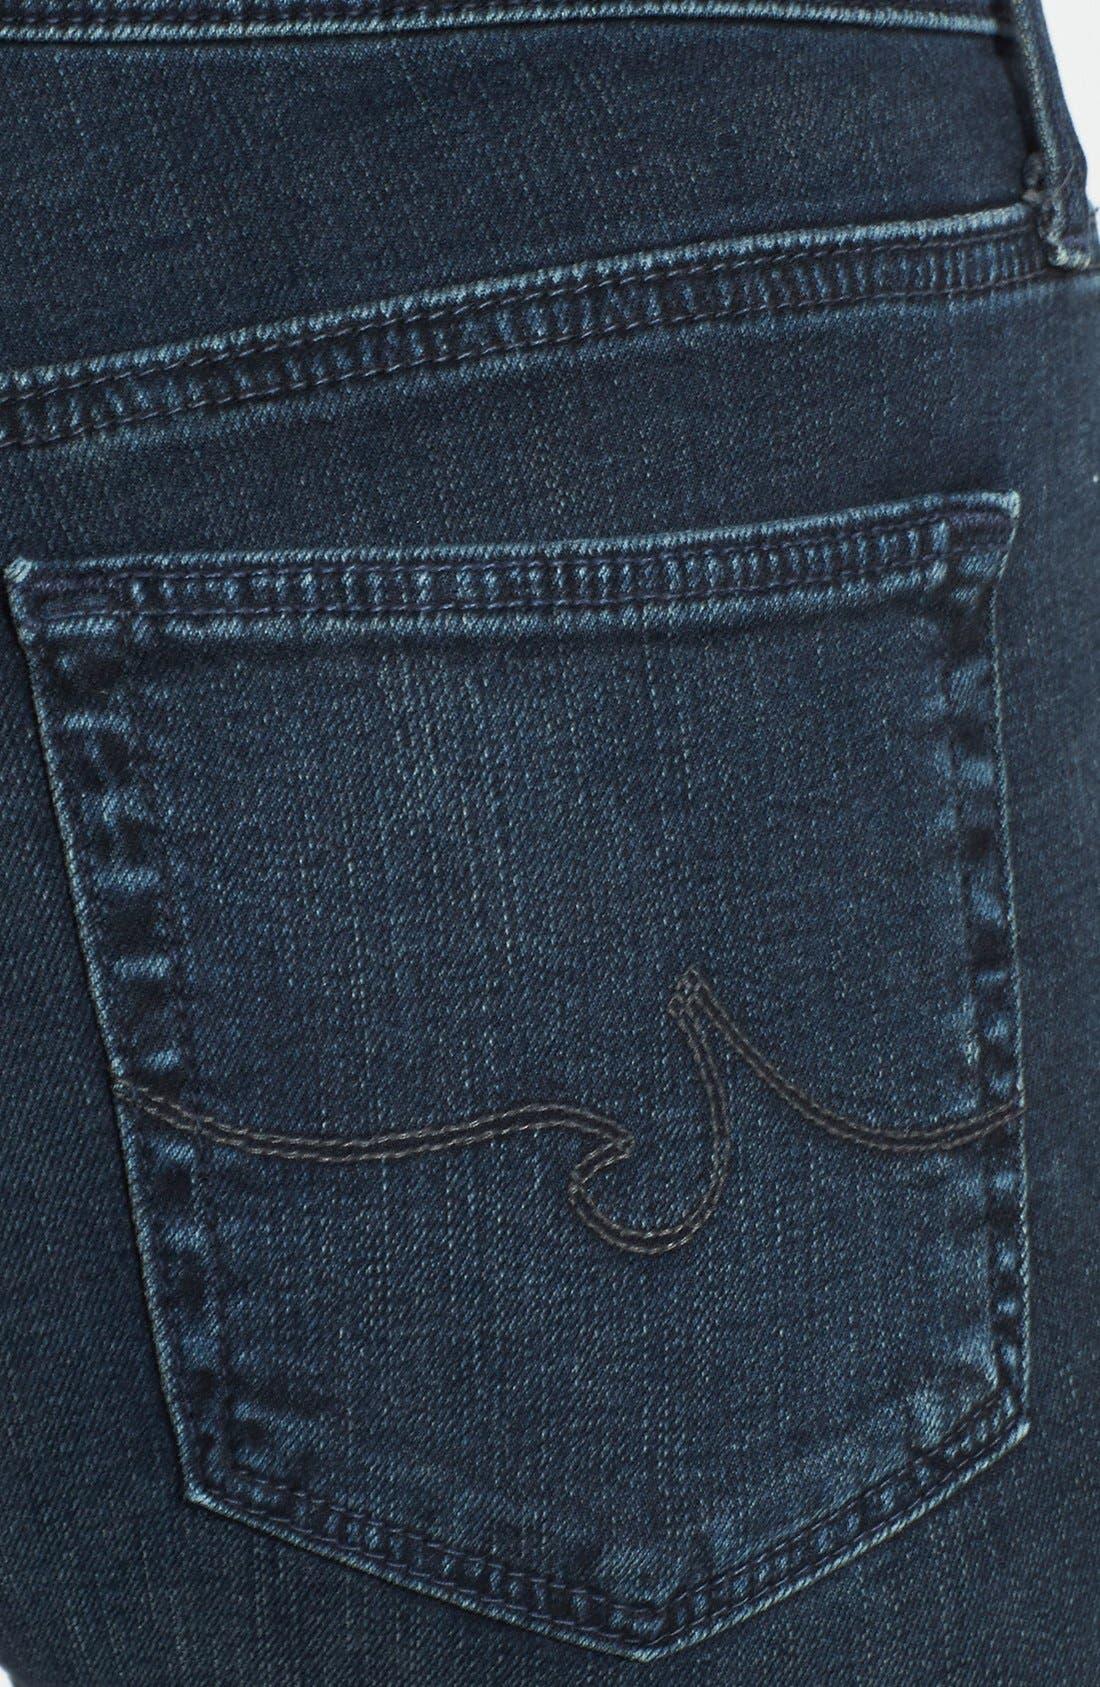 'The Farrah' High Rise Skinny Jeans,                             Alternate thumbnail 31, color,